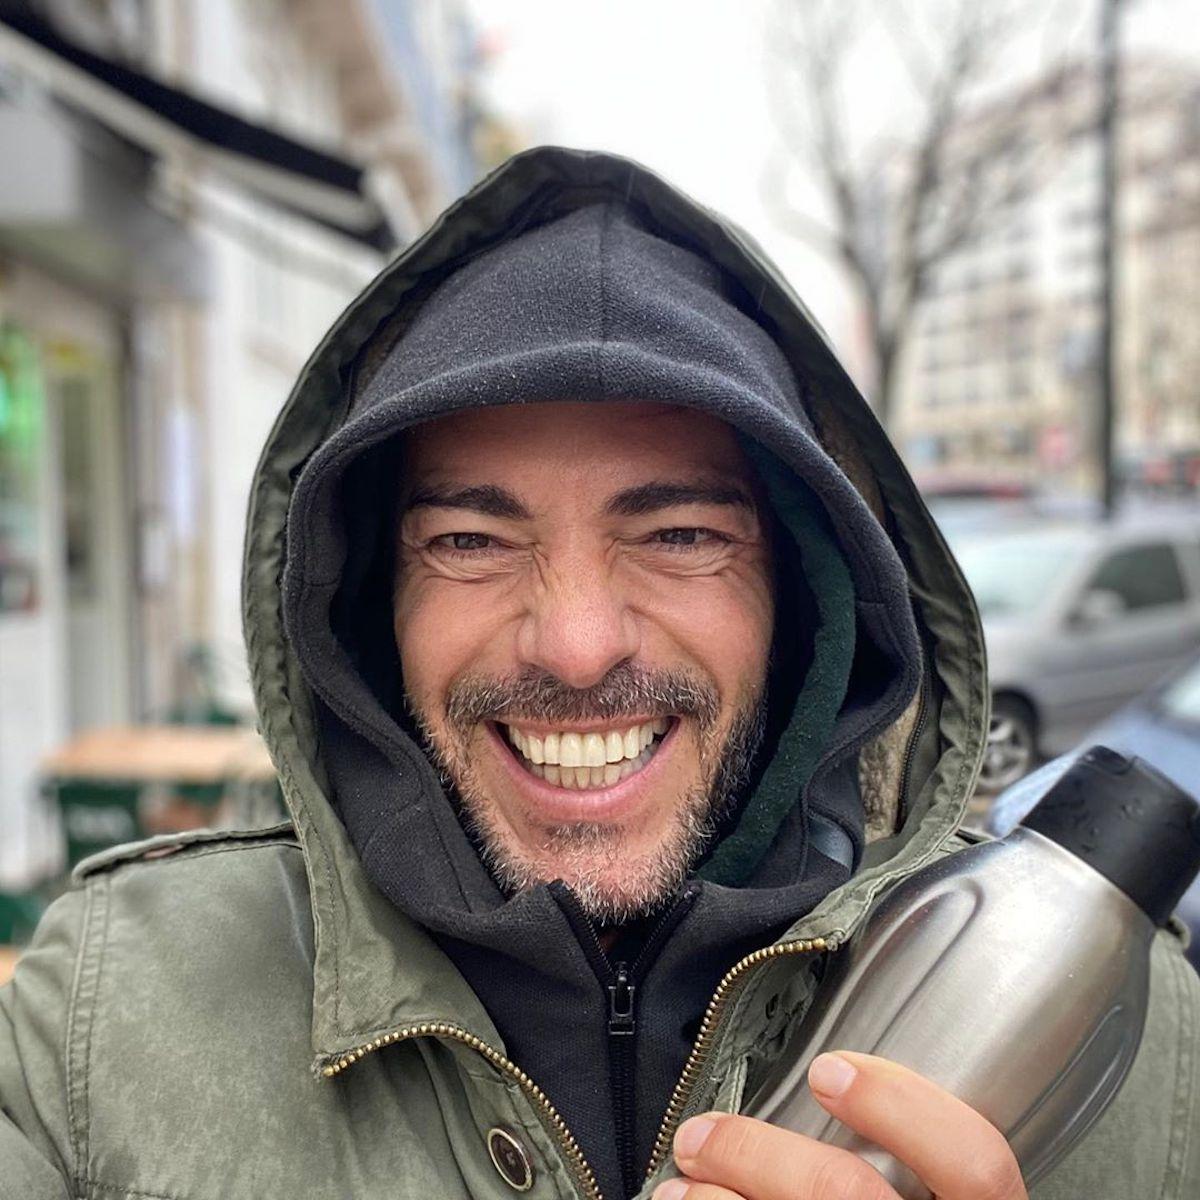 Claudio Ramos 5 Cláudio Ramos Quebra Rotina: &Quot;Apeteceu-Me Sentir O Dia Acordar&Quot;